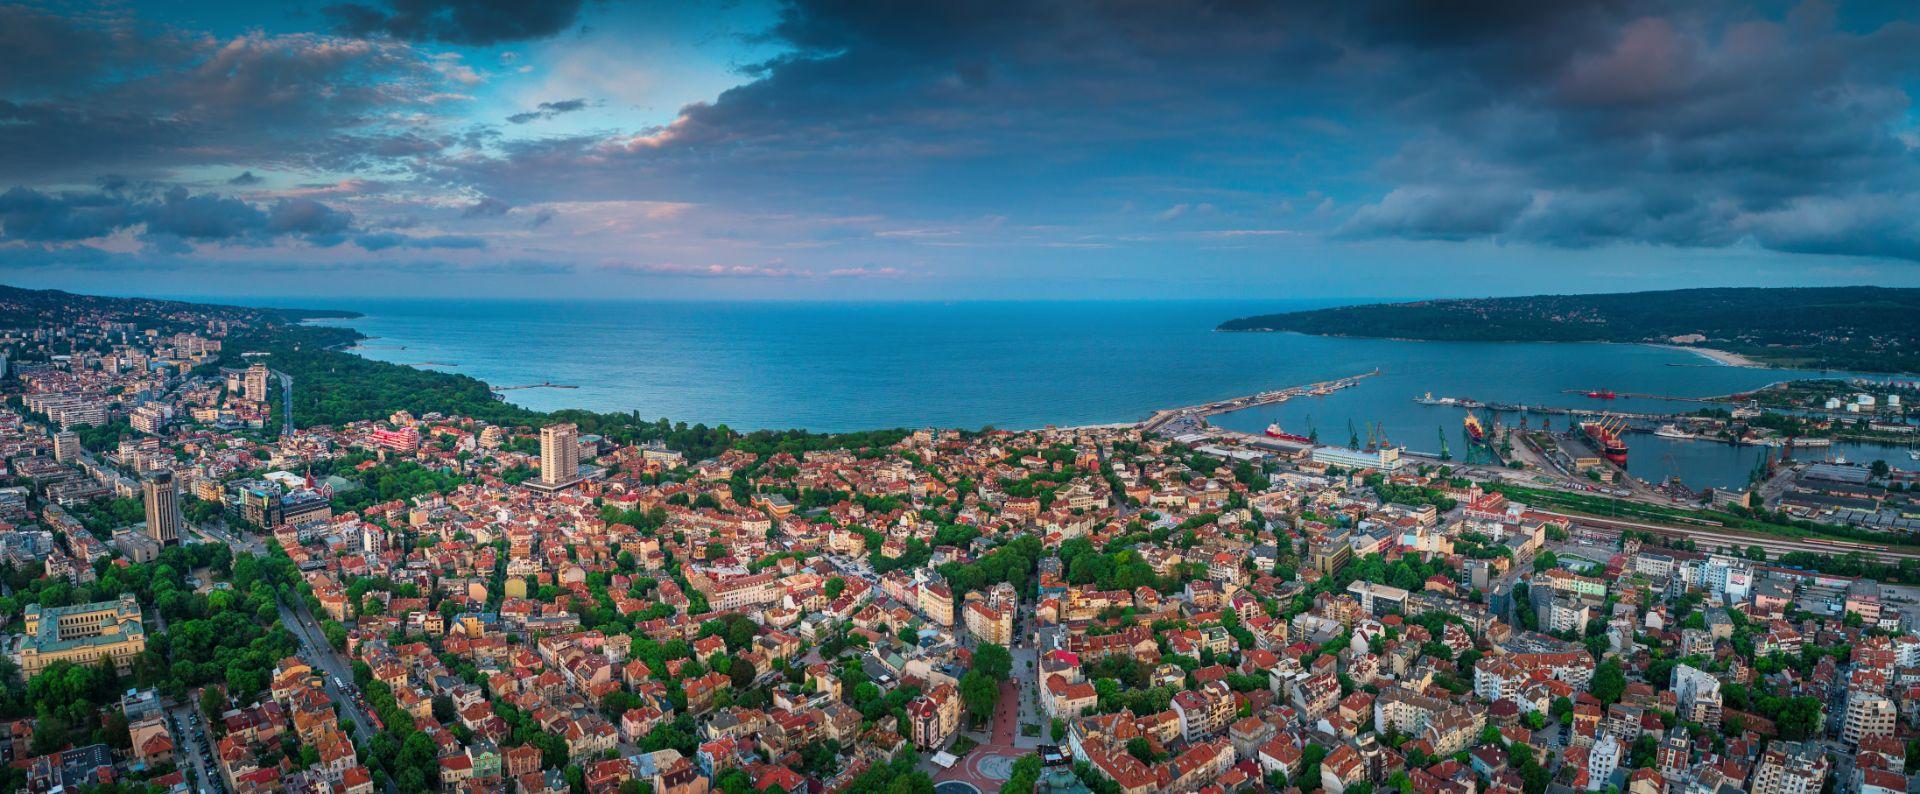 varna-bulgaria-mtlg-meetologue-sea-scenic-view-lighthouse-beach-sea-sand